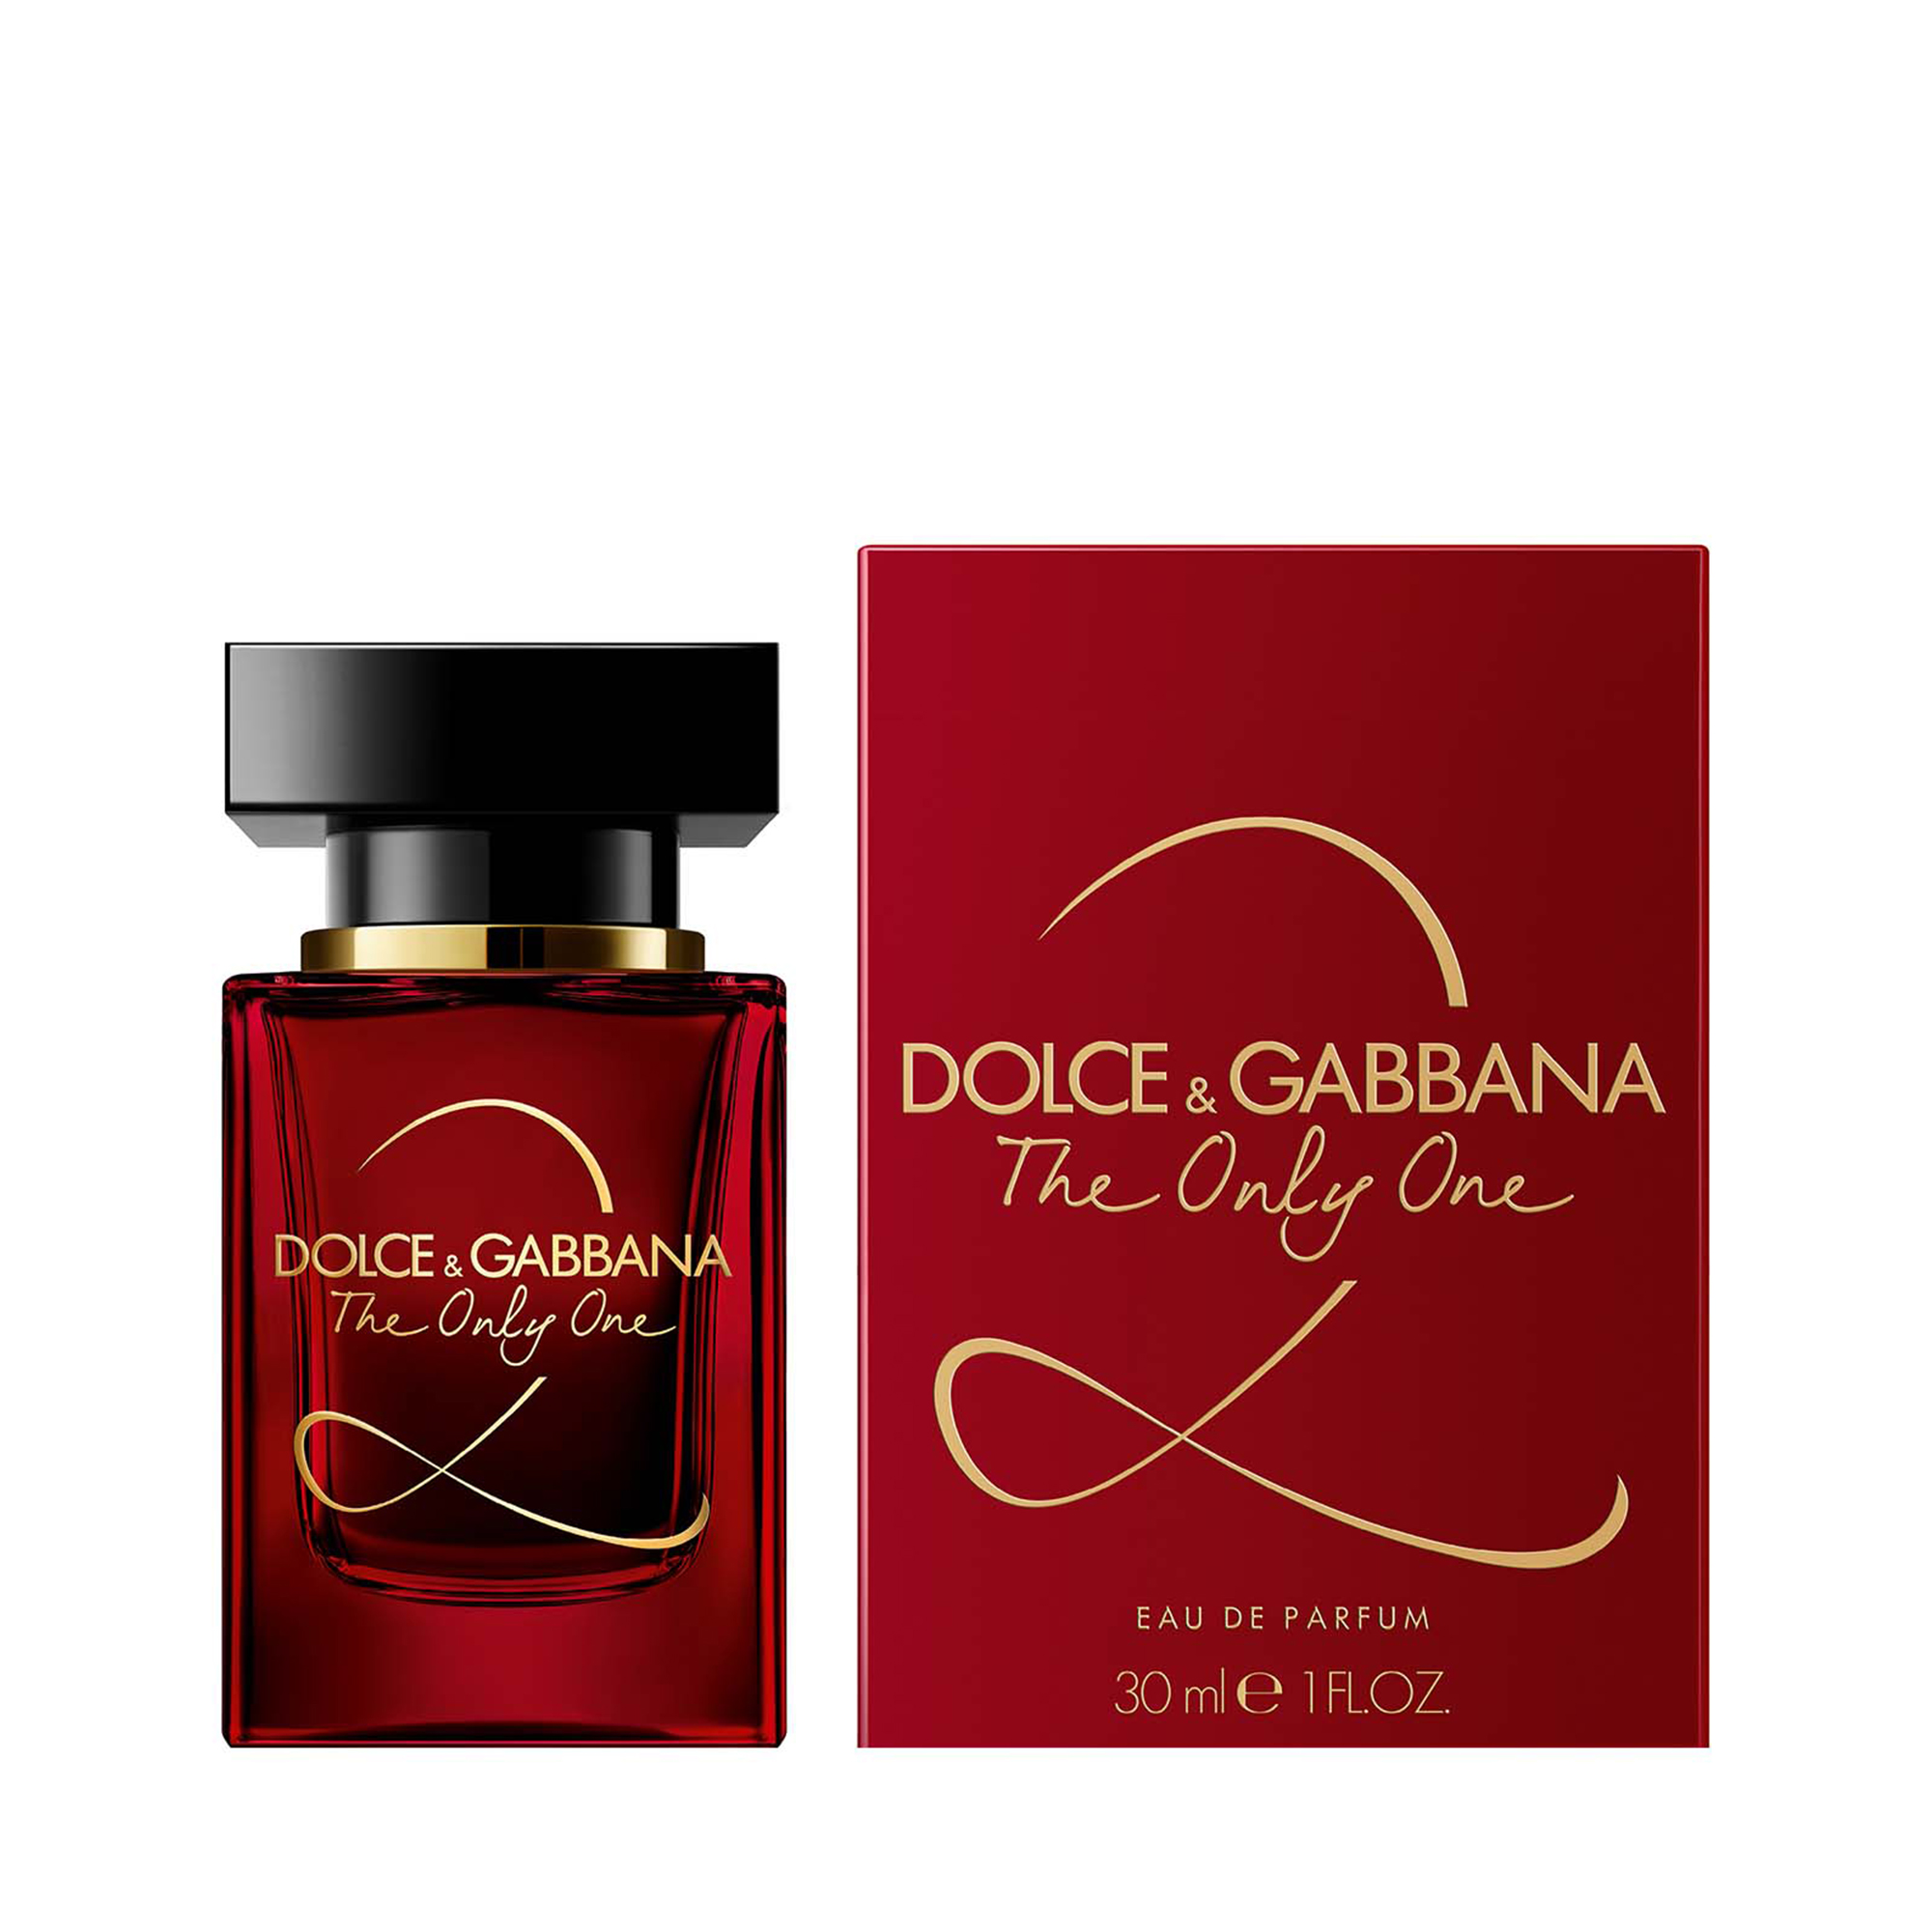 Dolce & Gabbana parfyme KICKS